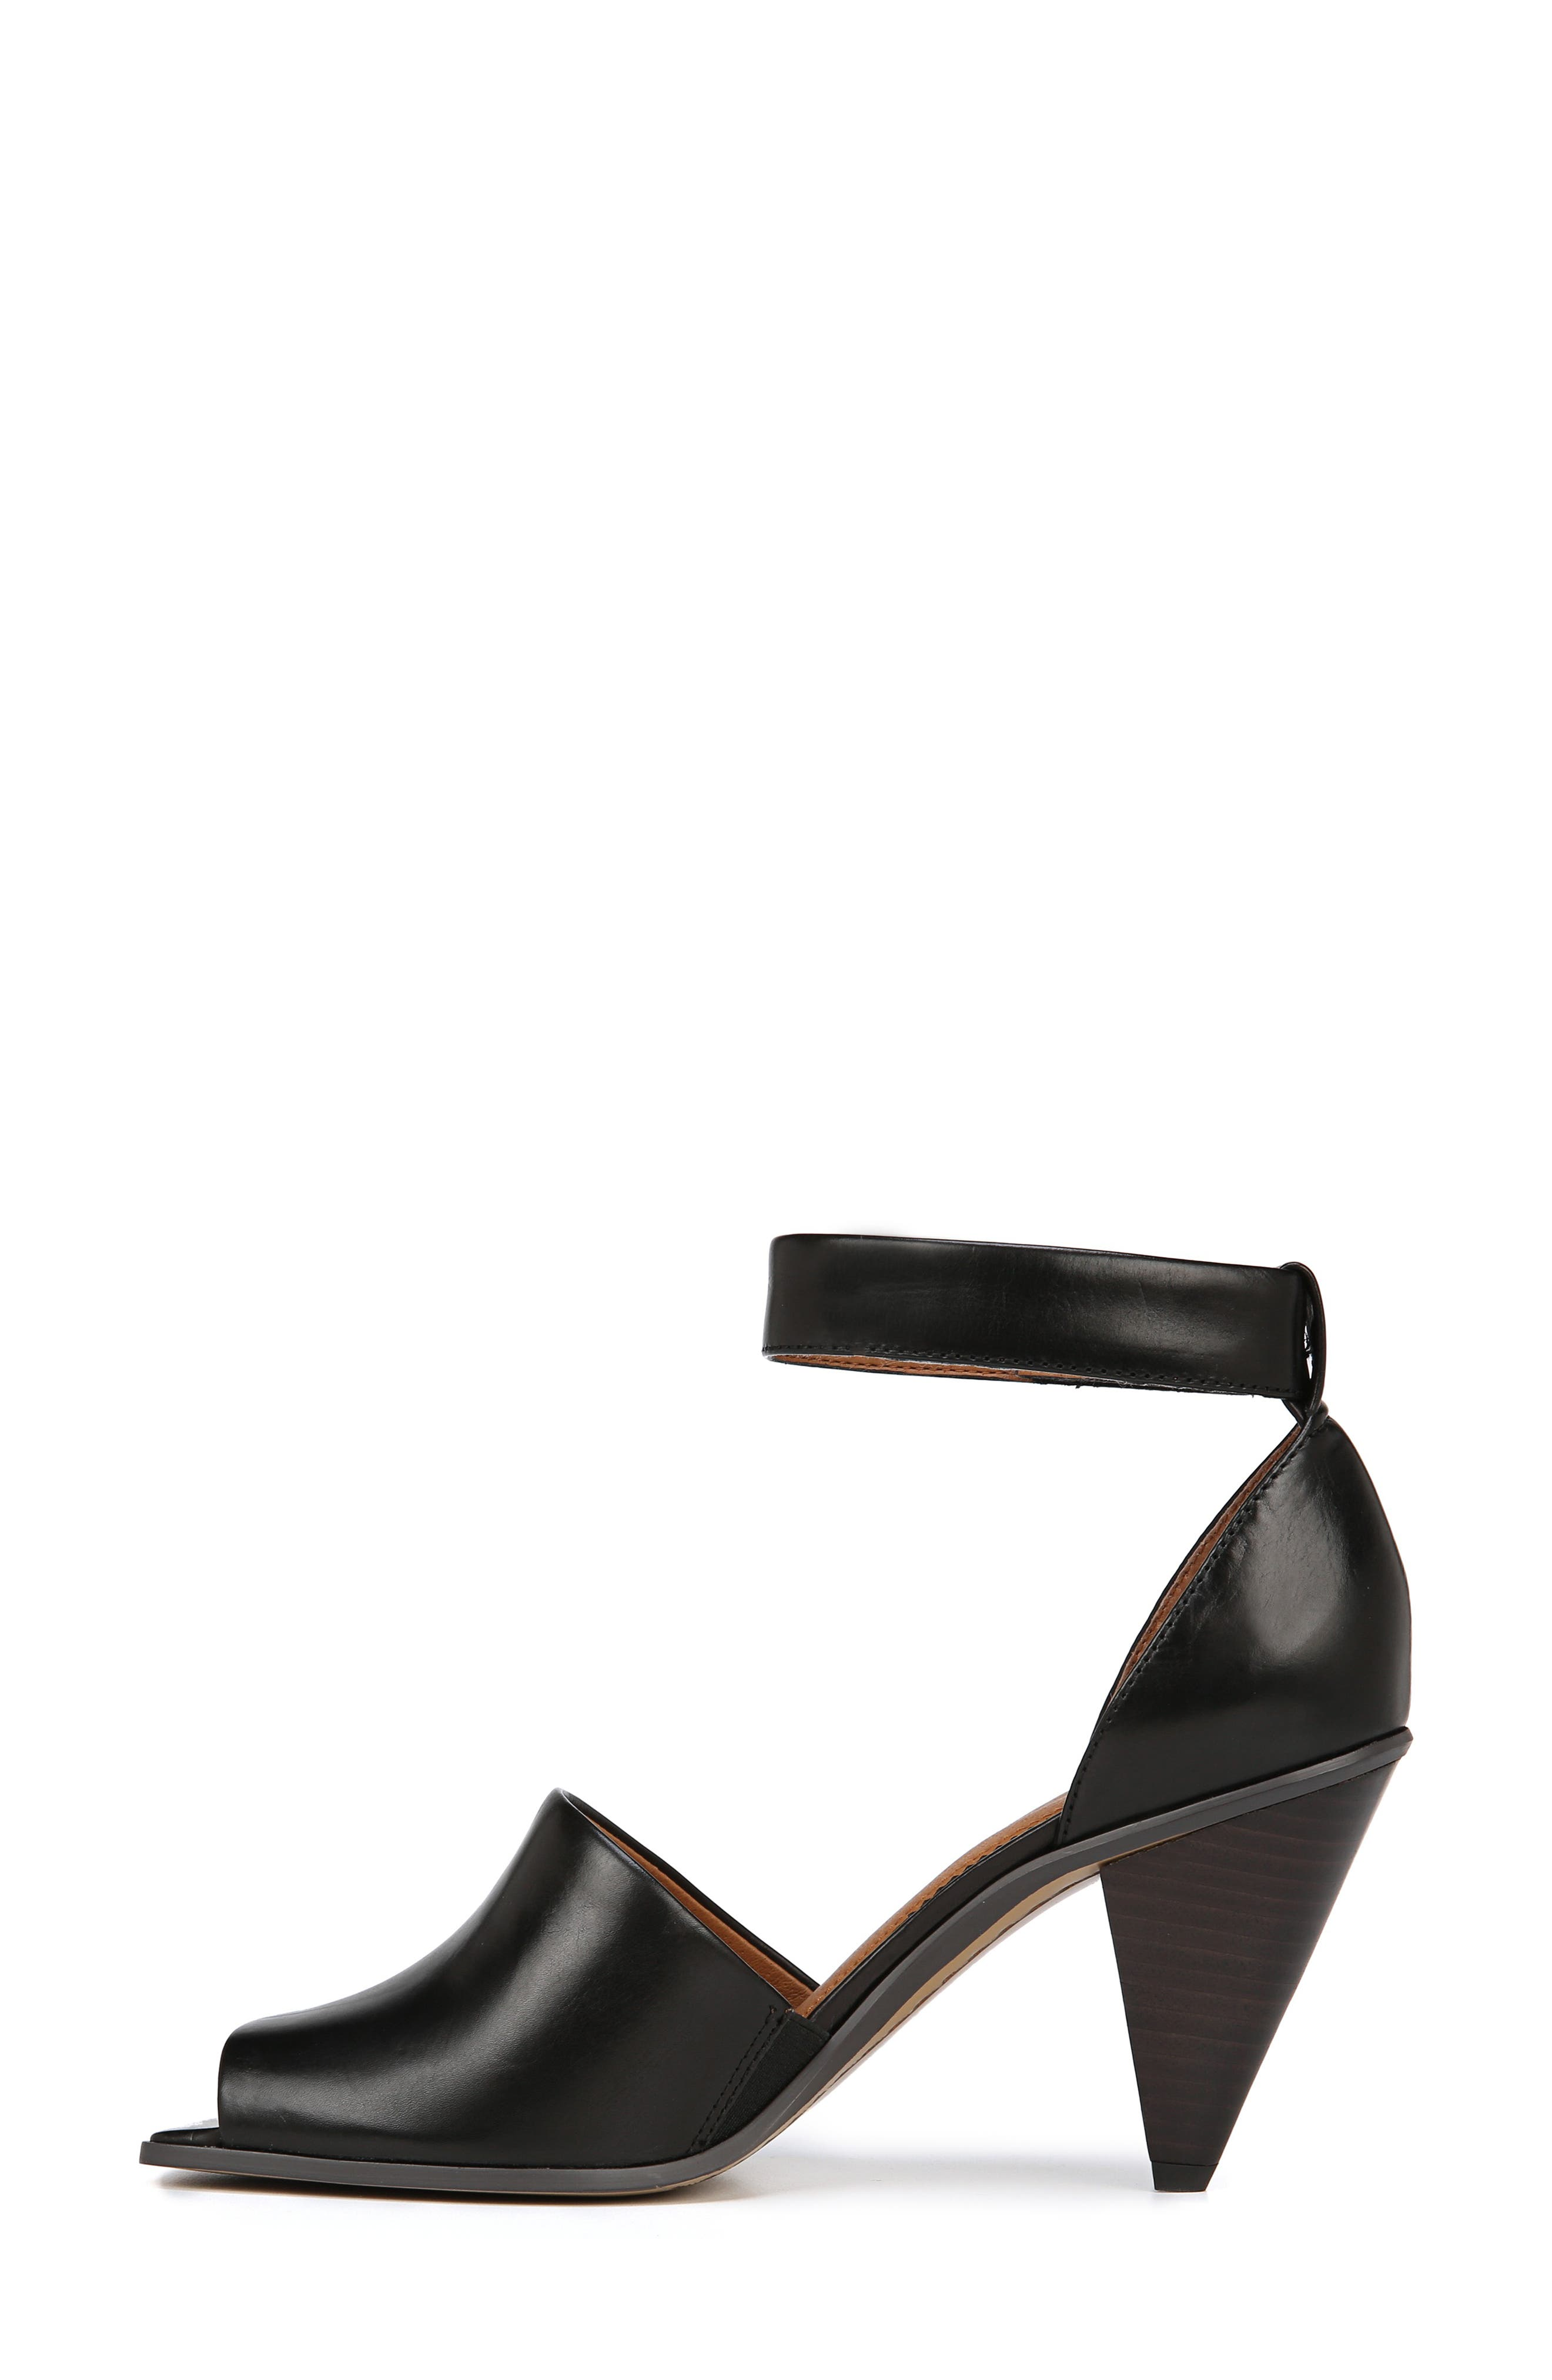 SARTO BY FRANCO SARTO, Ankle Strap Sandal, Alternate thumbnail 9, color, BLACK FOULARD LEATHER